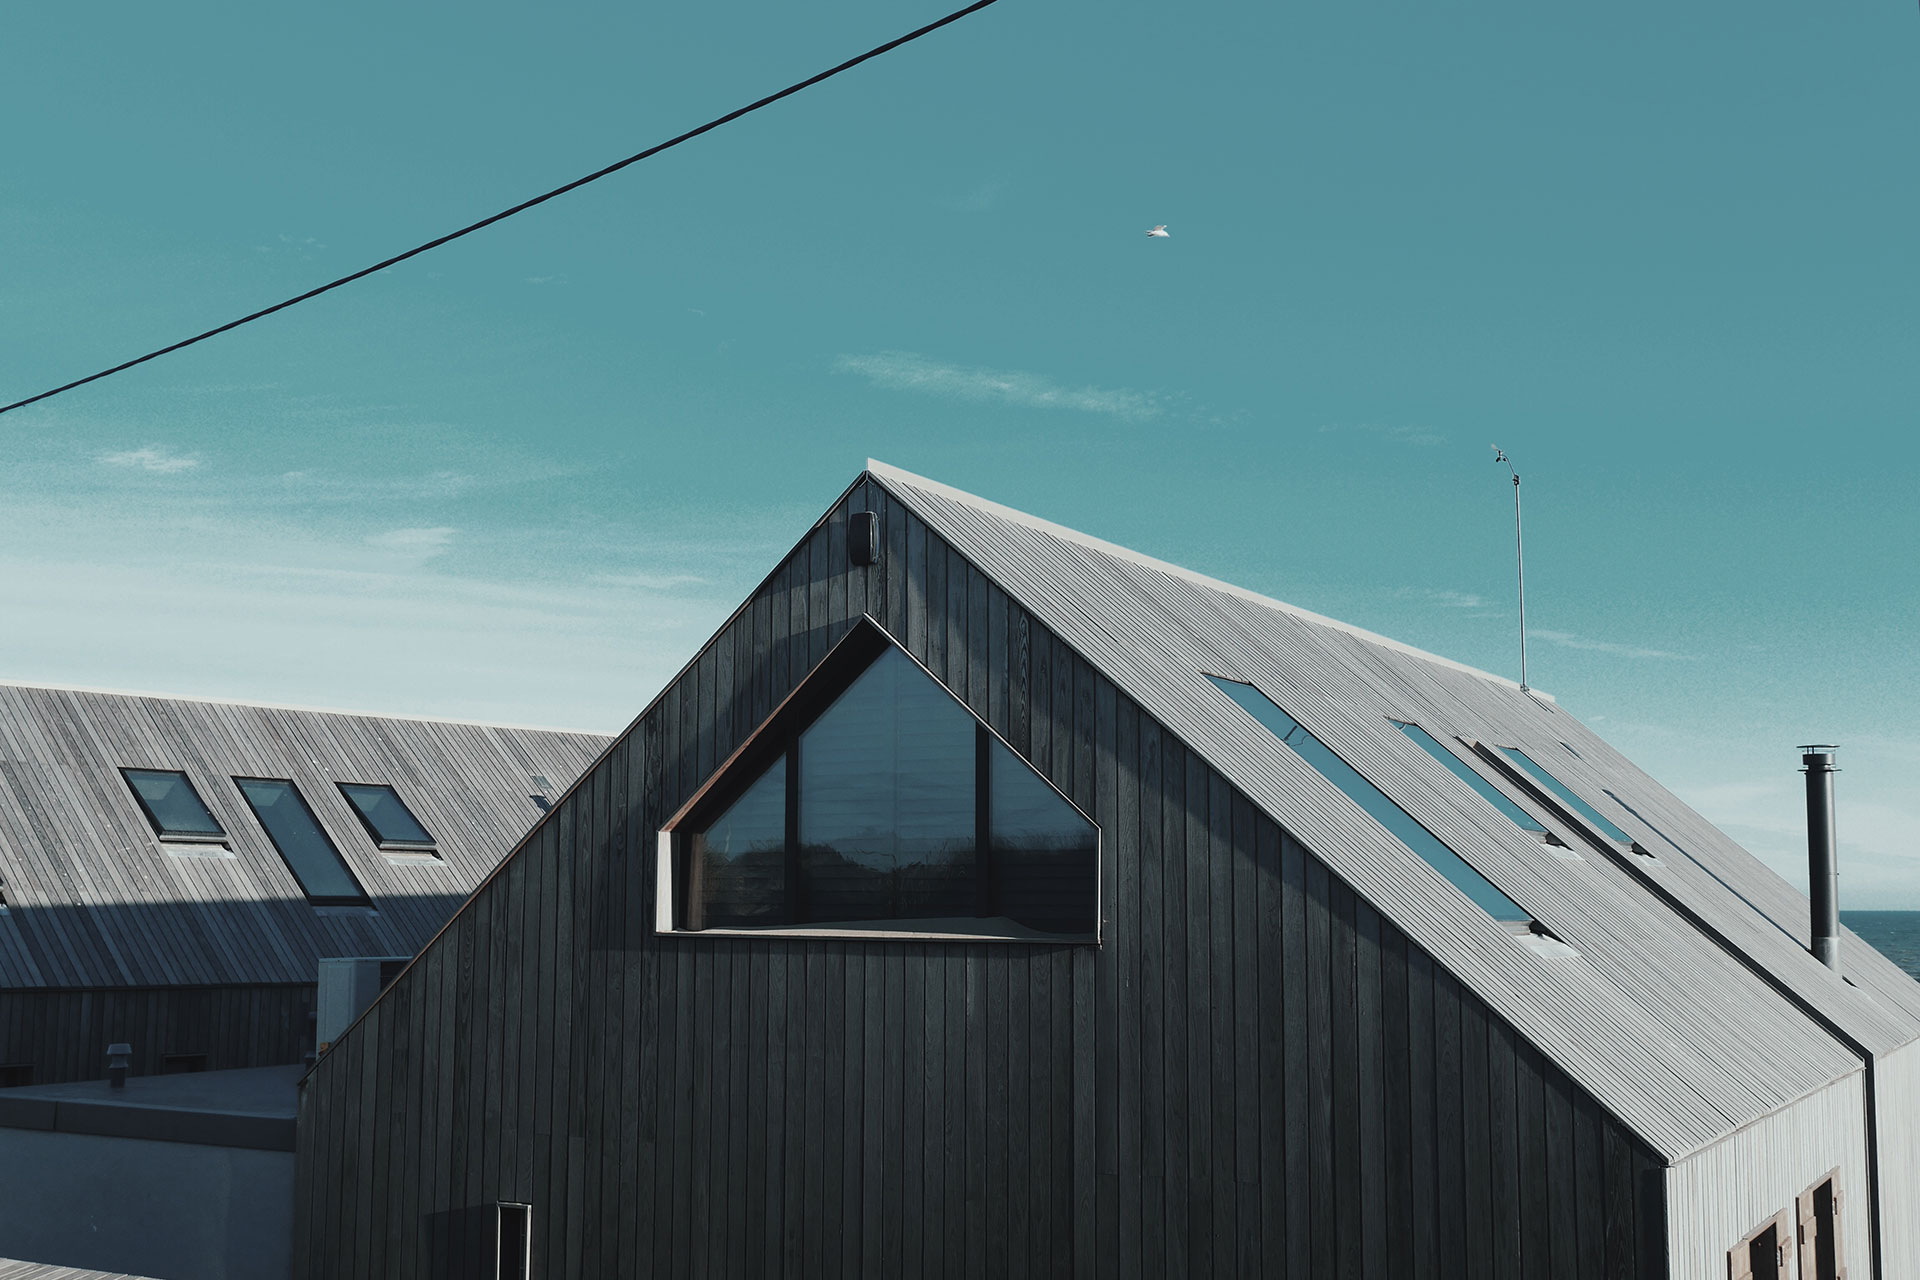 Roofing – Storm Damage/Repair